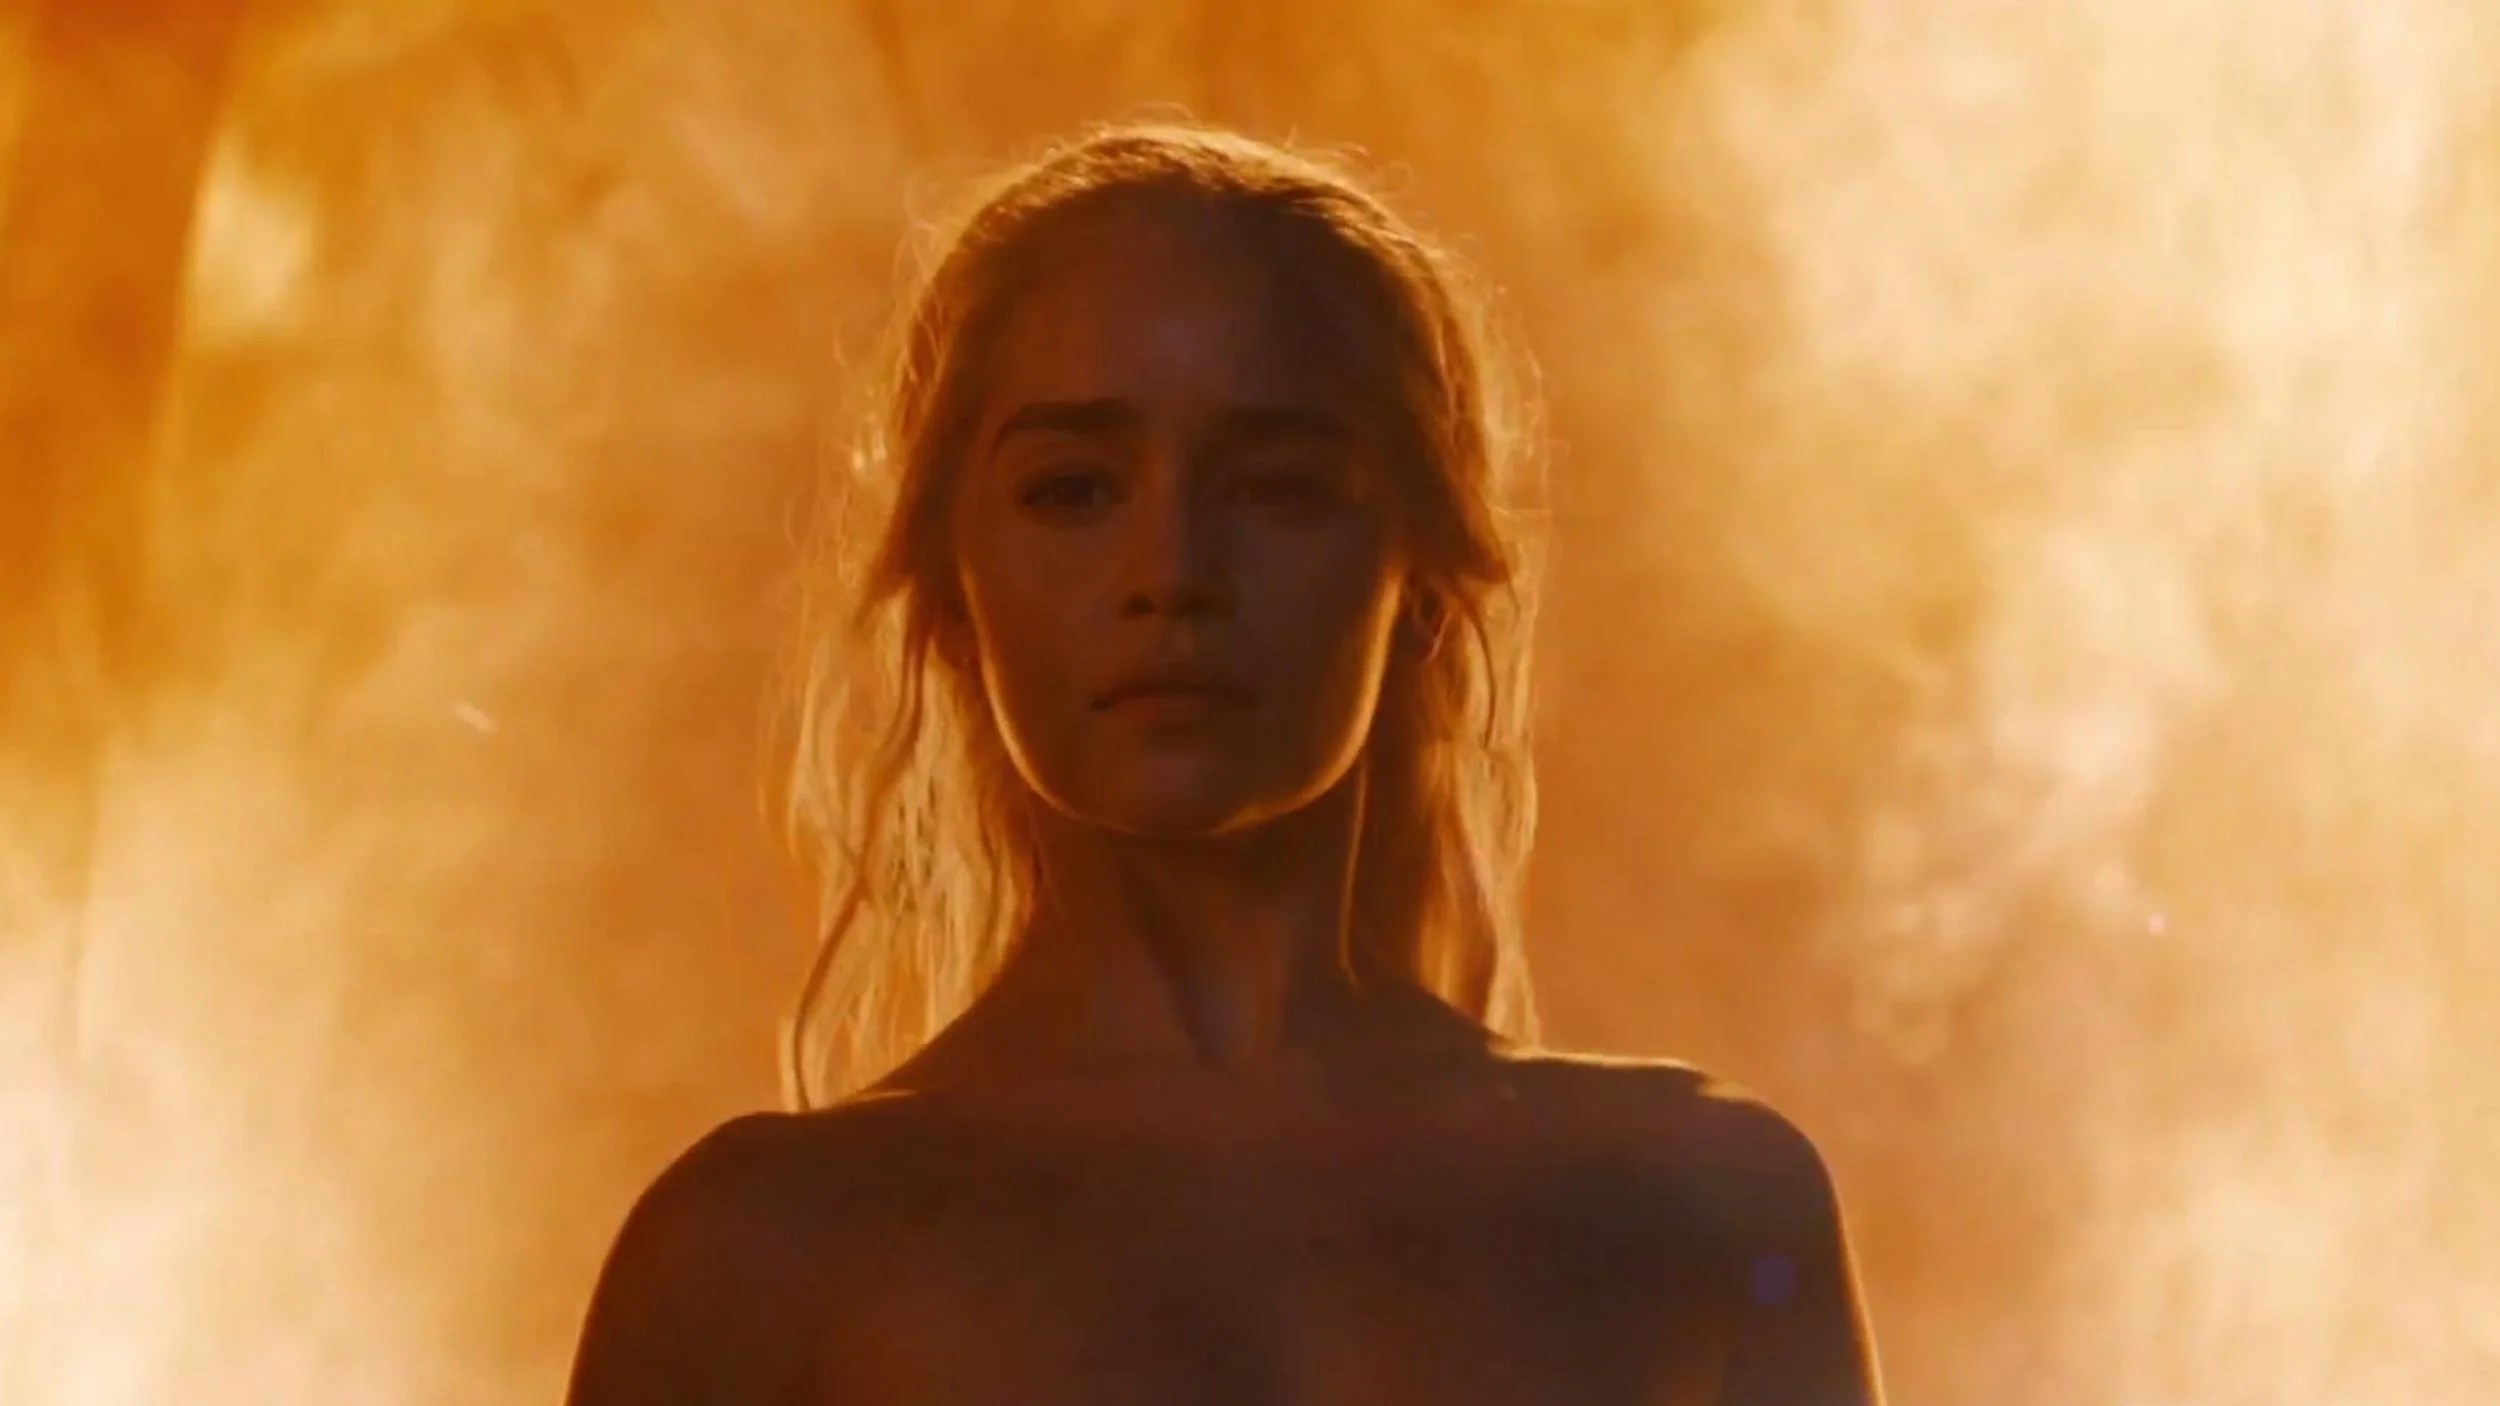 Emilia Clarke Reveals How She Handles Filming Game Of Thrones Nude Scenes